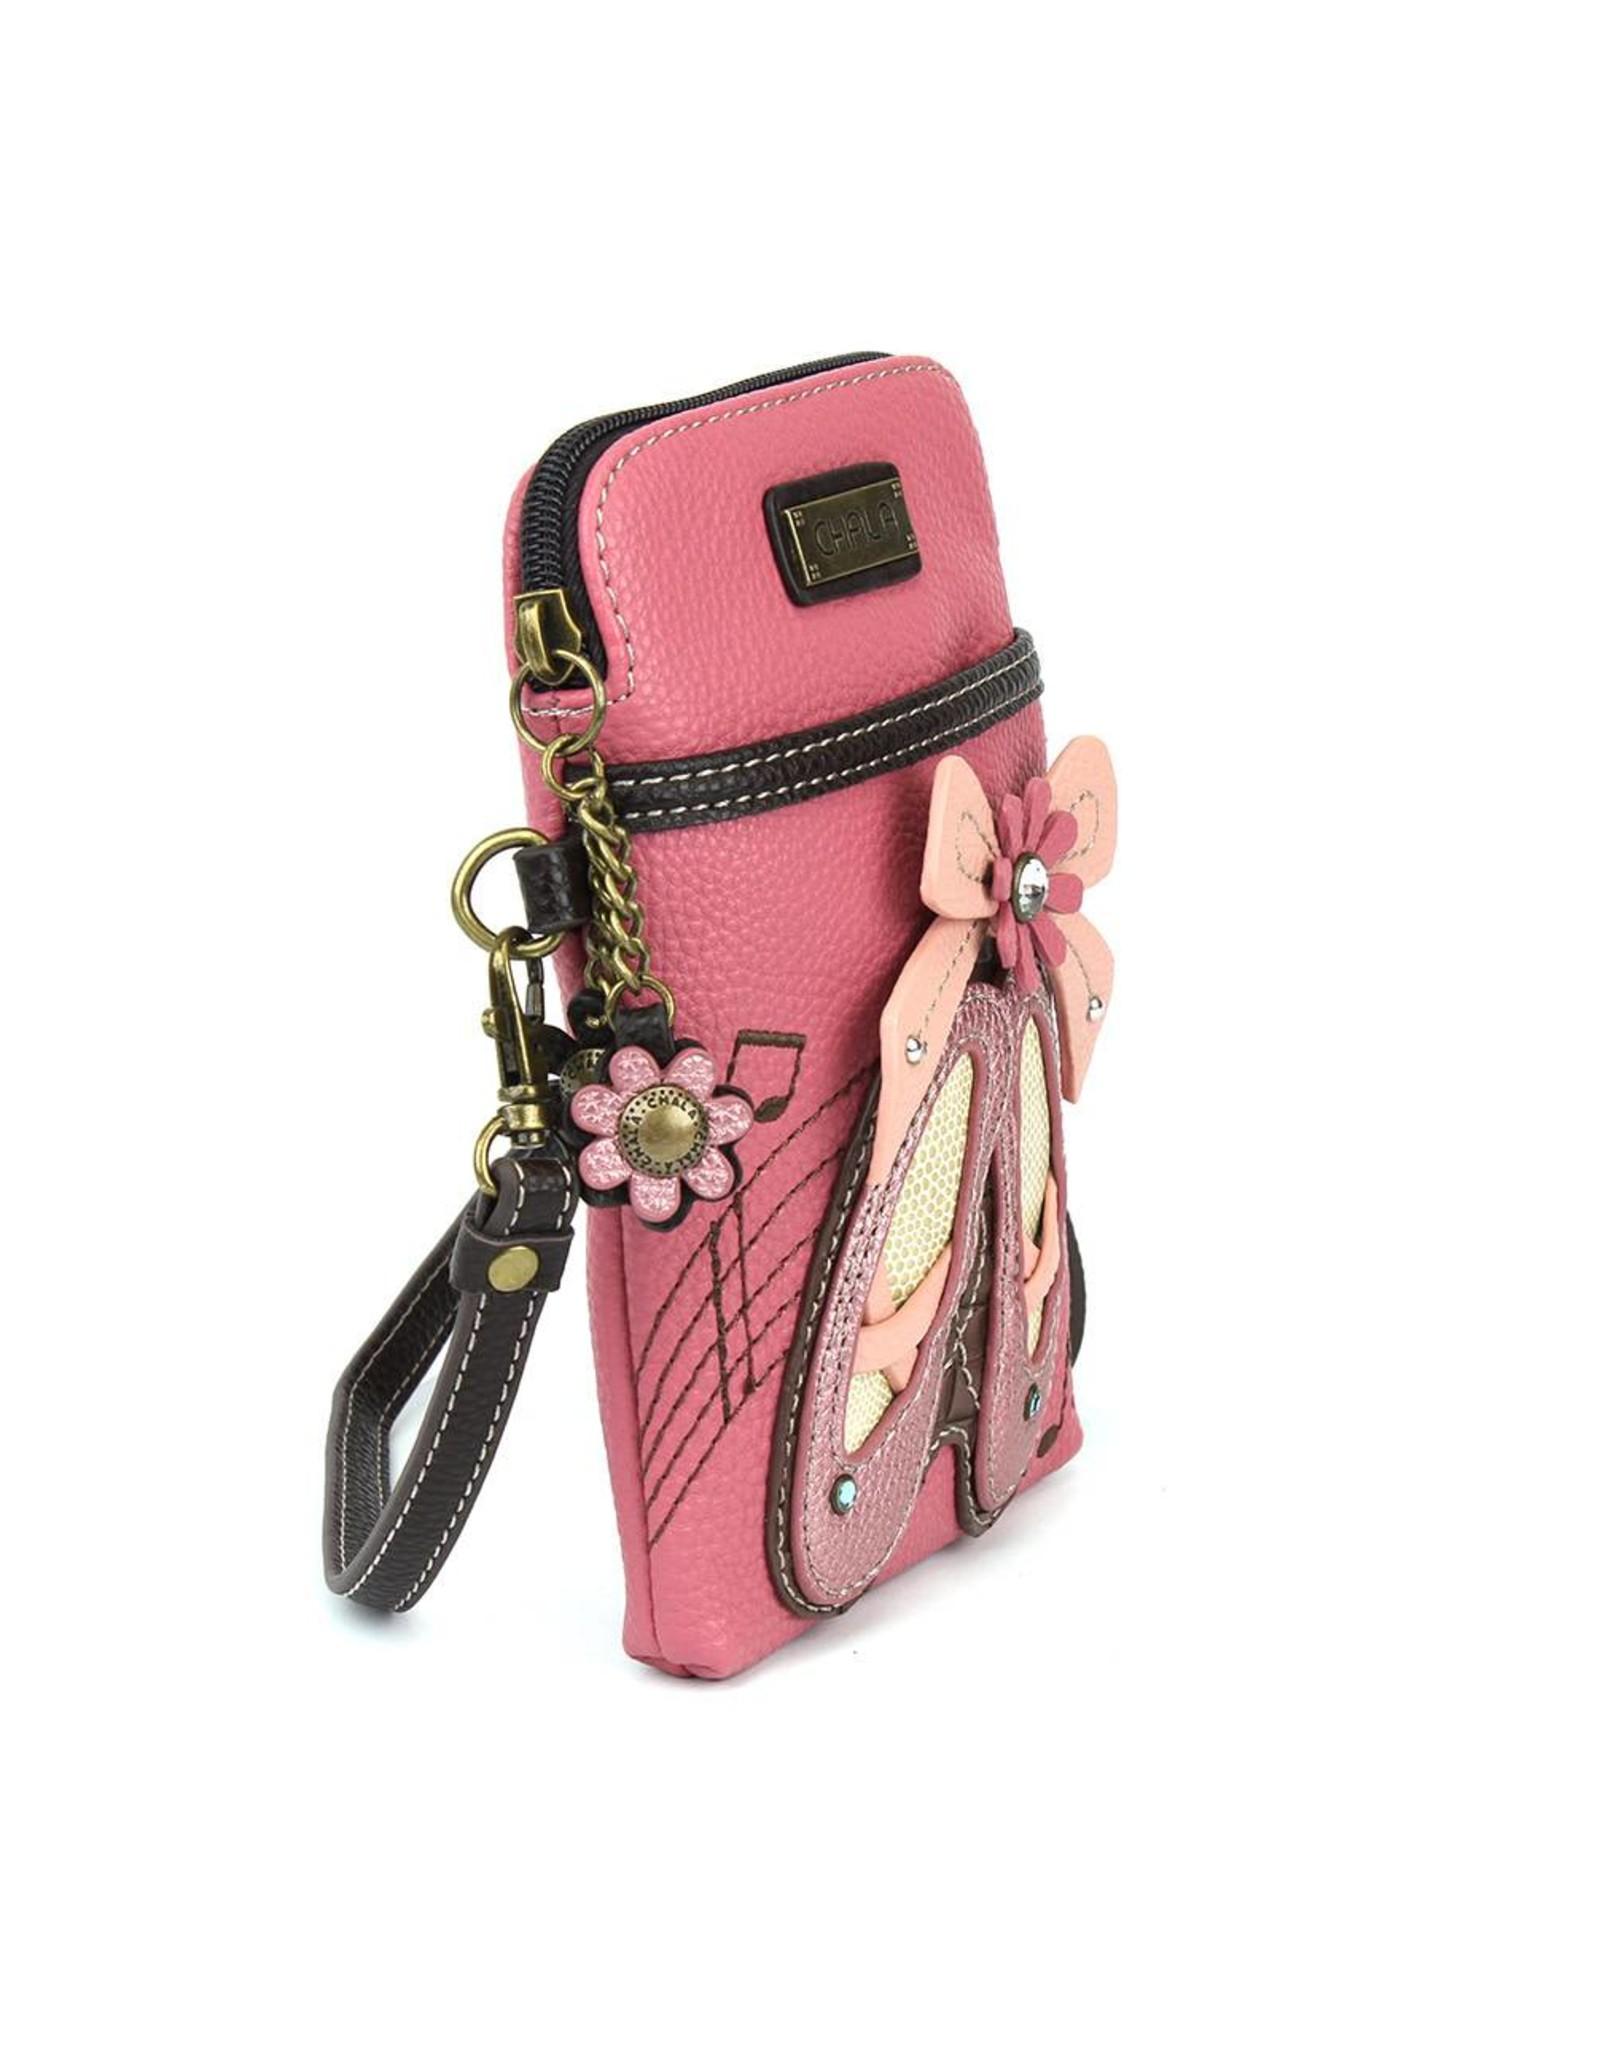 Chala Cell Phone Crossbody Ballerina